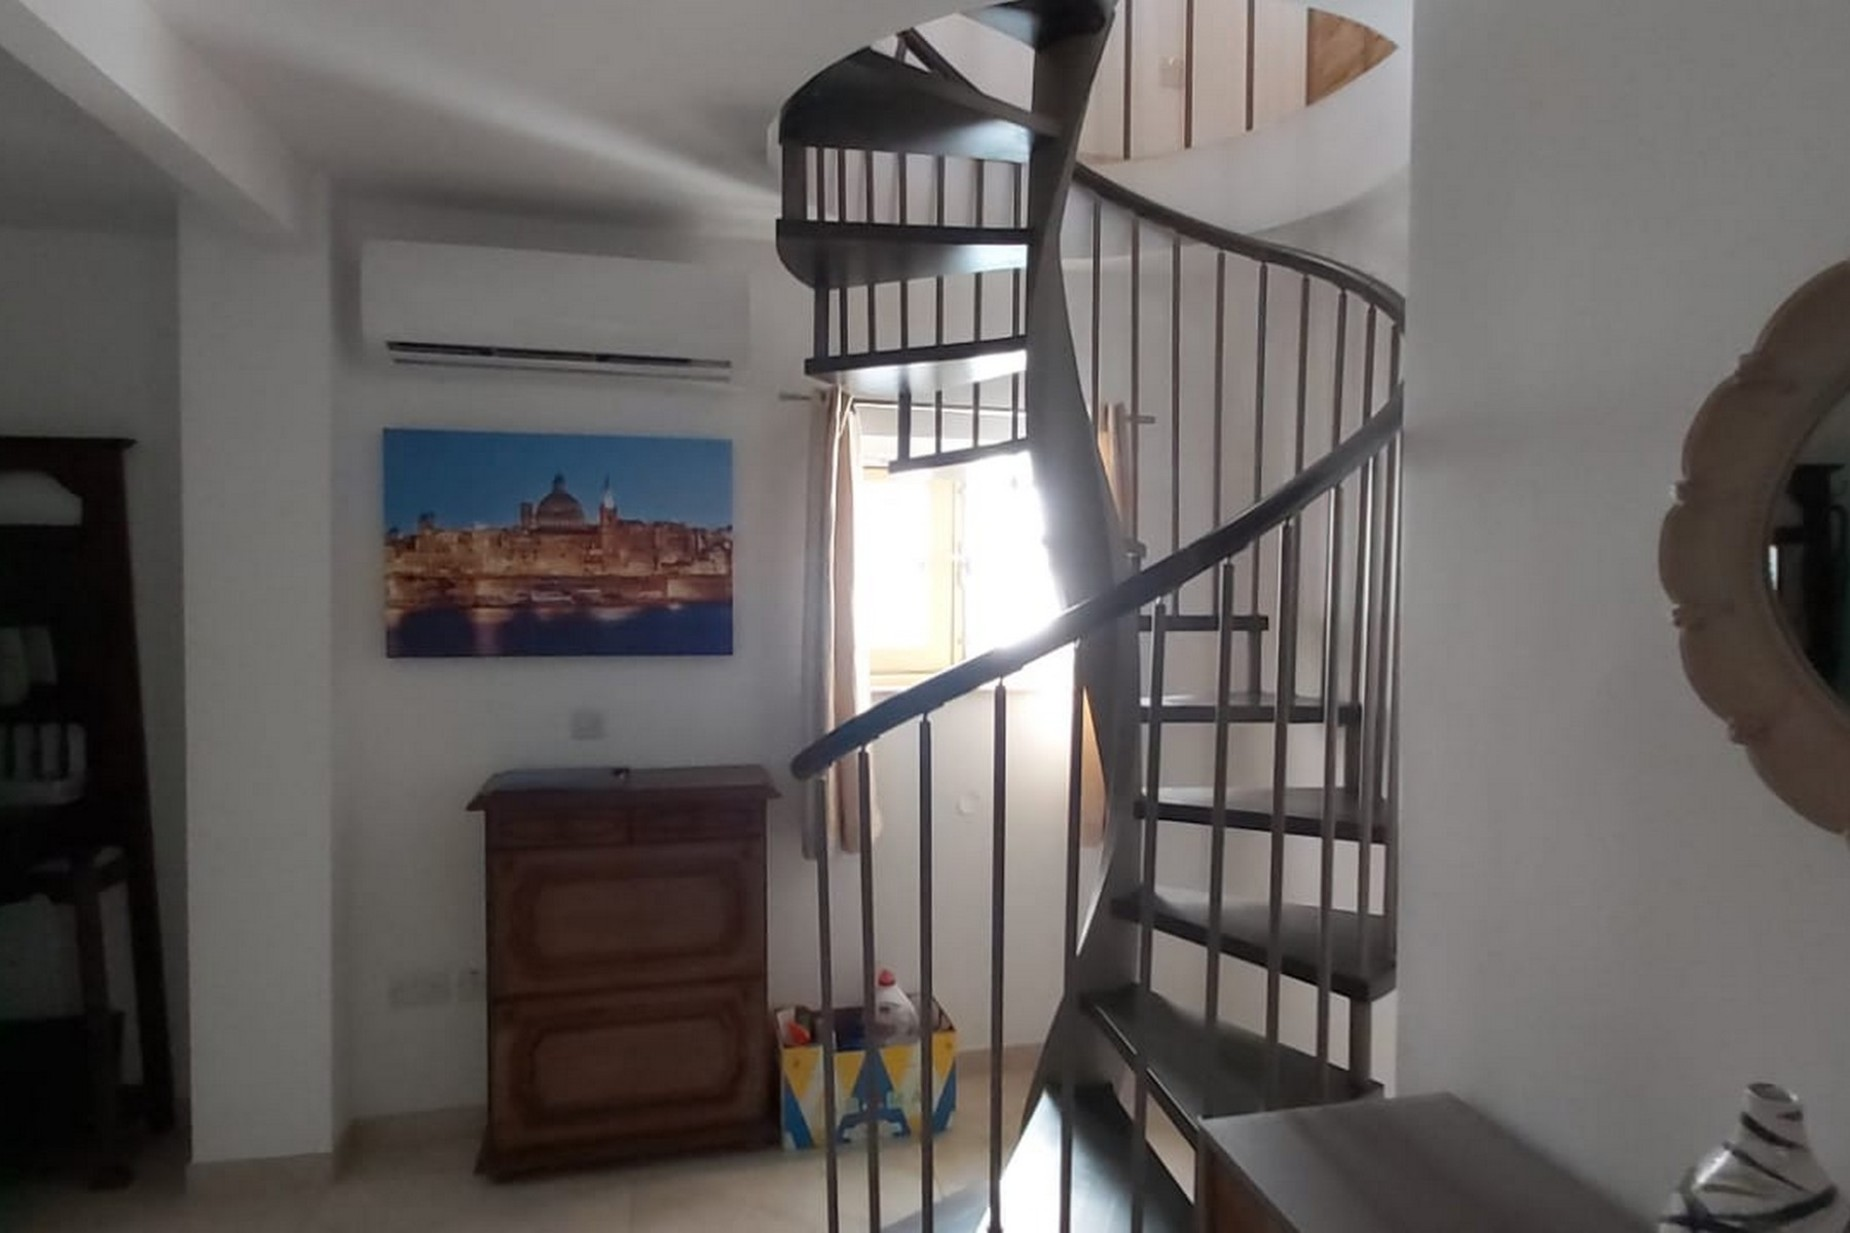 4 bed  For Sale in Valletta, Valletta - thumb 11